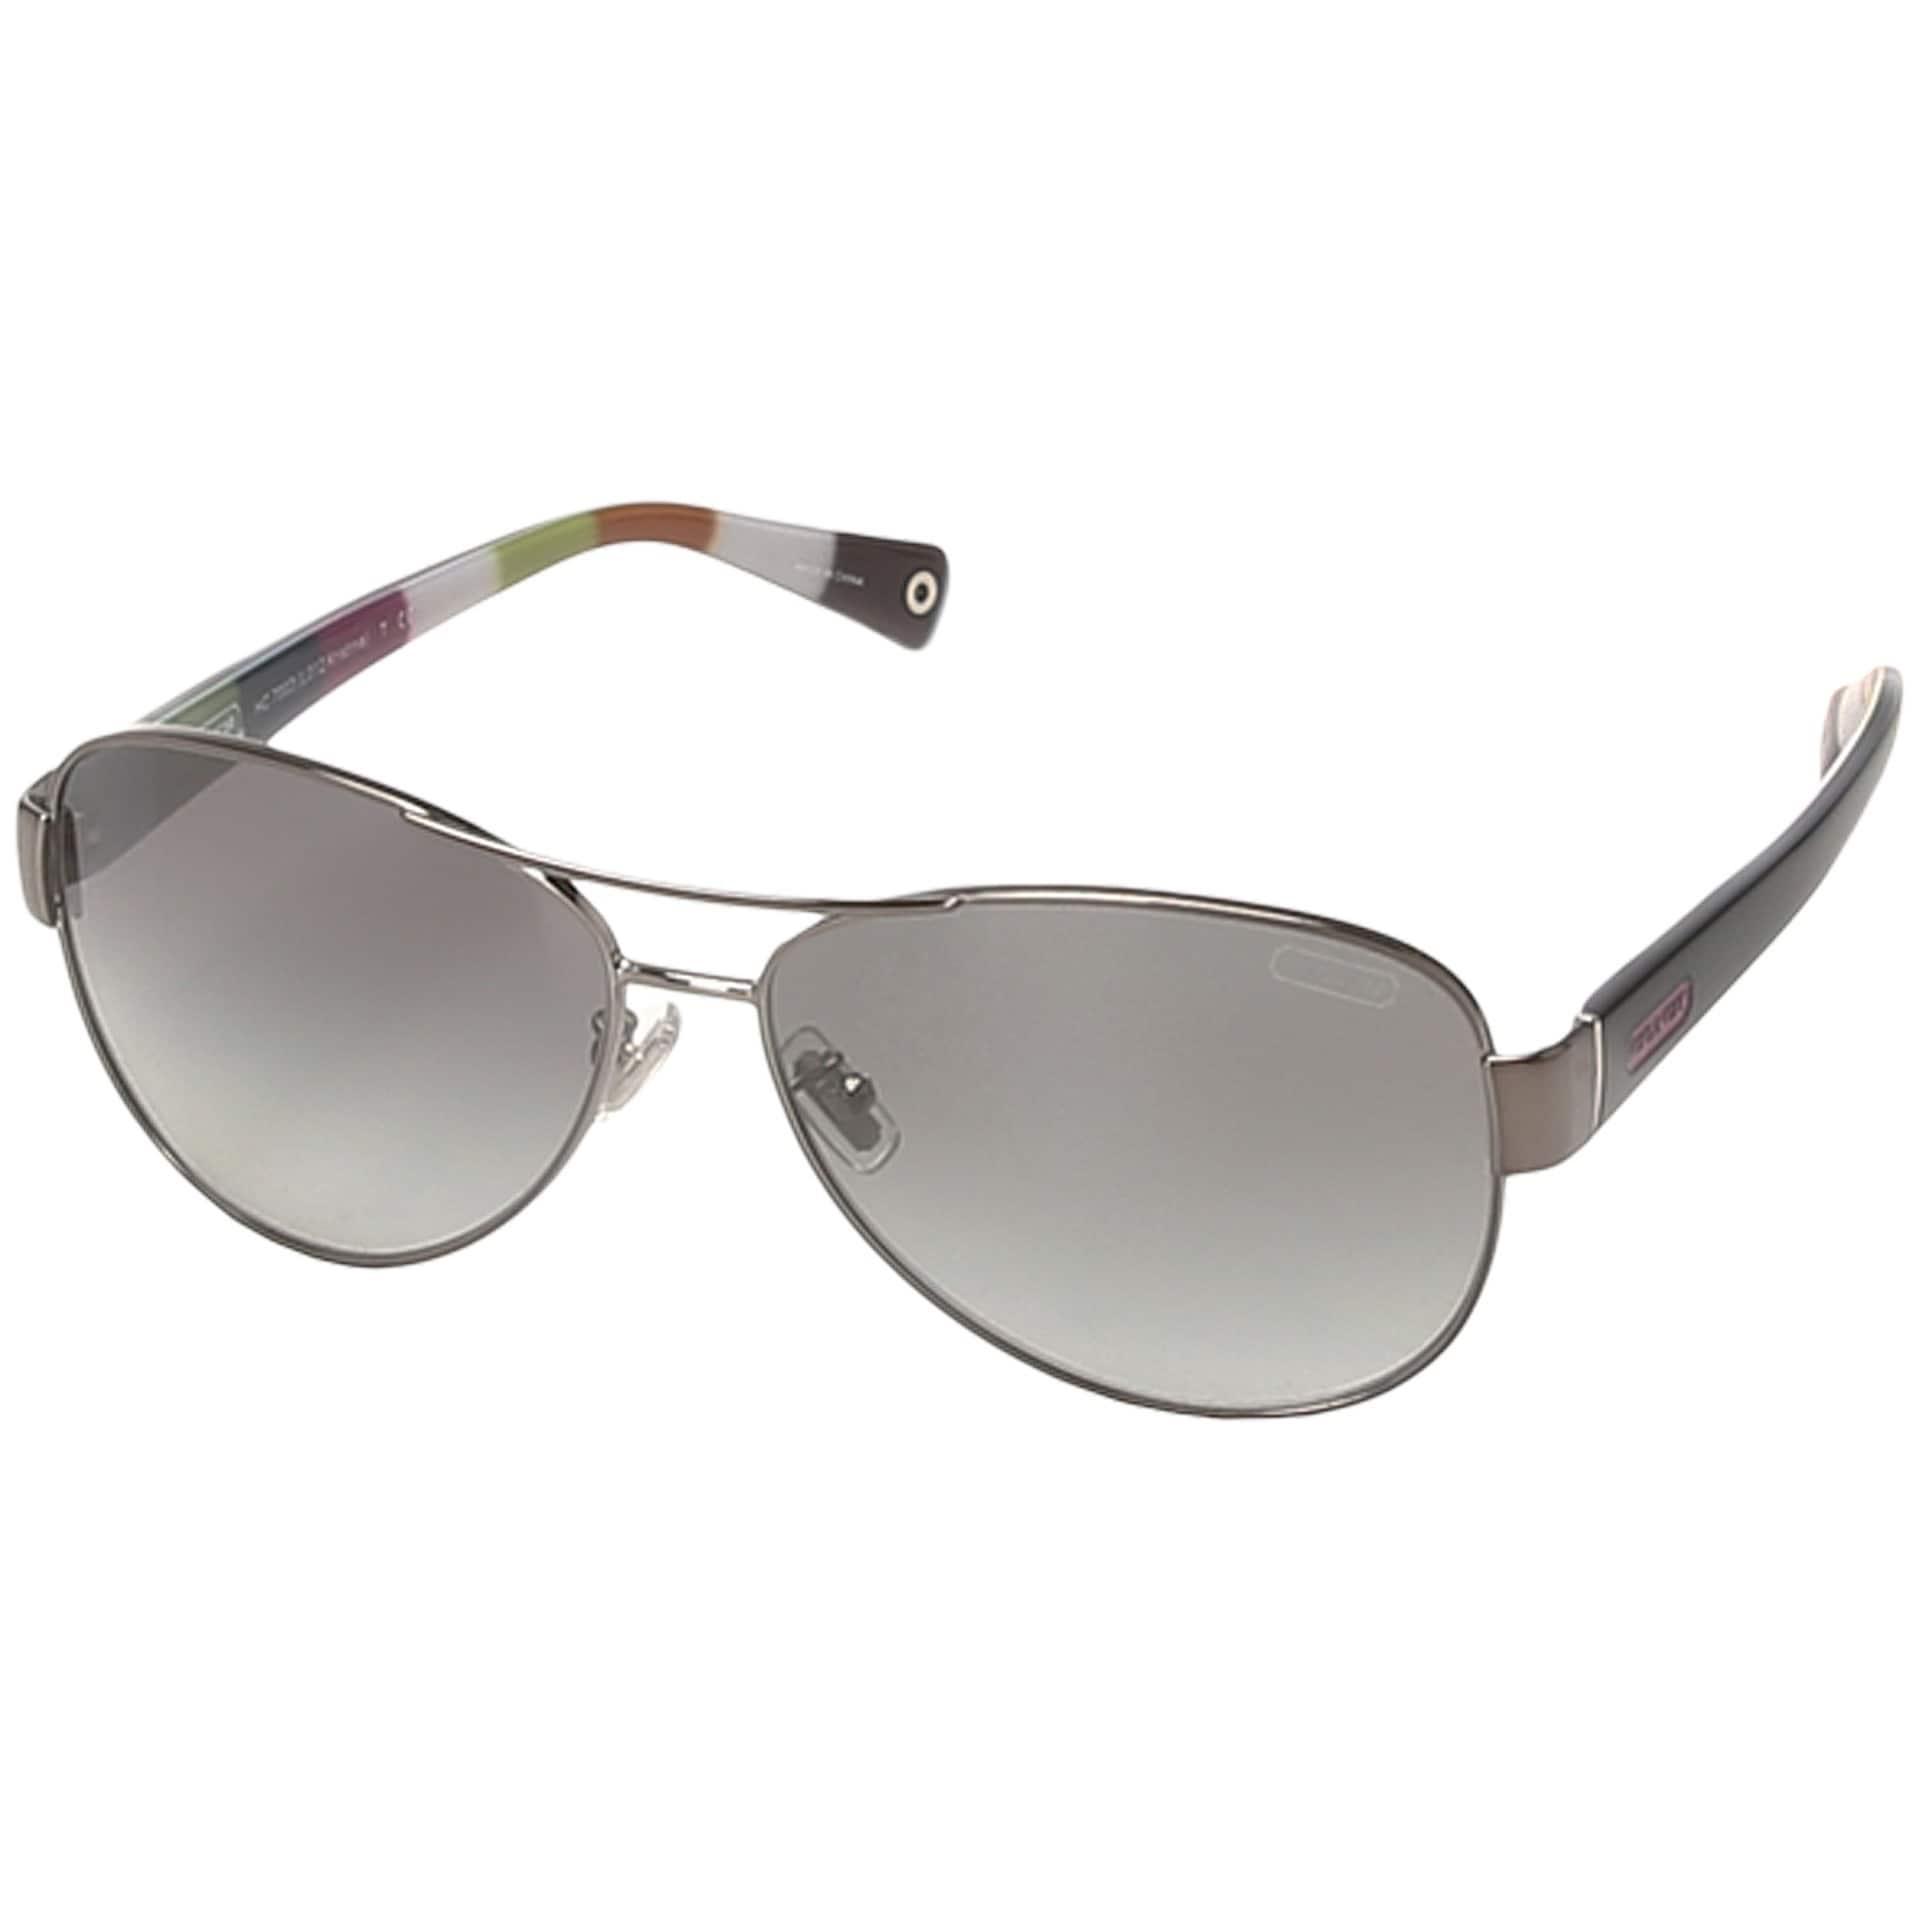 b115c449dd promo code for coach hc8241 551087 black rectangle sunglasses 57 17 140  1948e d115a  wholesale shop coach womens l012 kristina hc7003 9010t3 metal  aviator ...